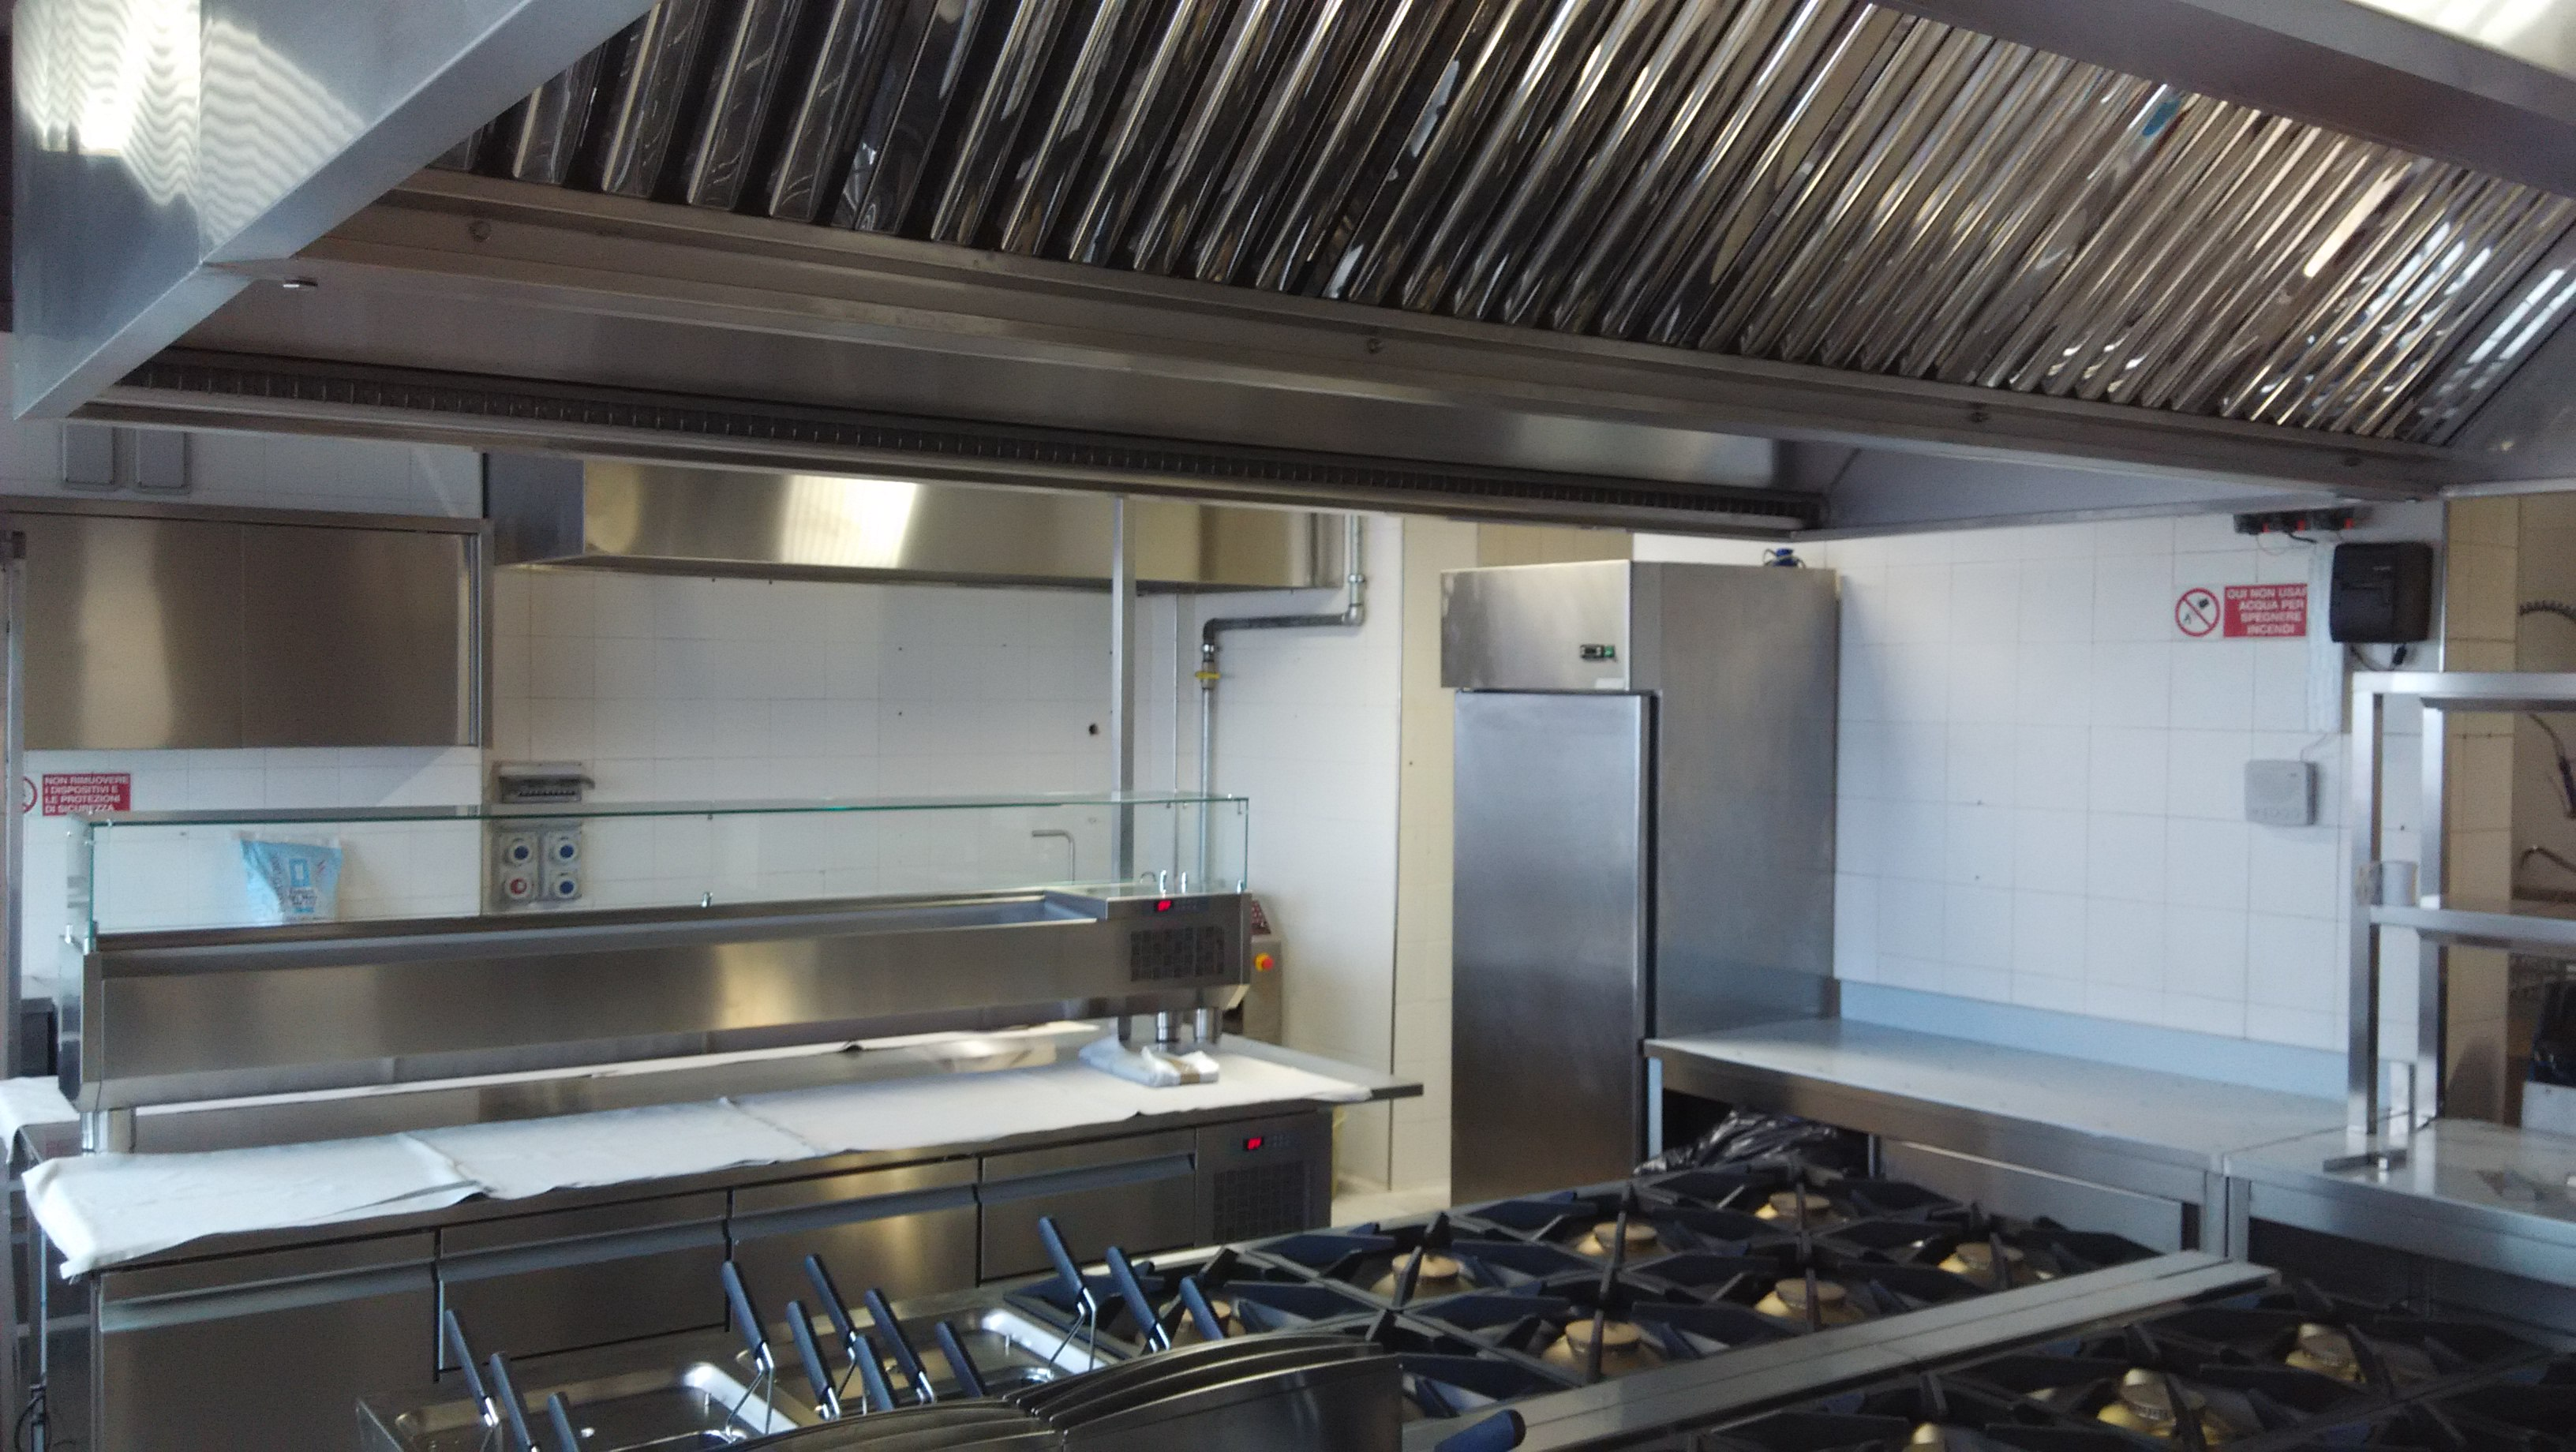 Installazione cappe cucina e impianti di aspirazione abbattitori di fuliggine - Cappa cucina senza canna fumaria ...